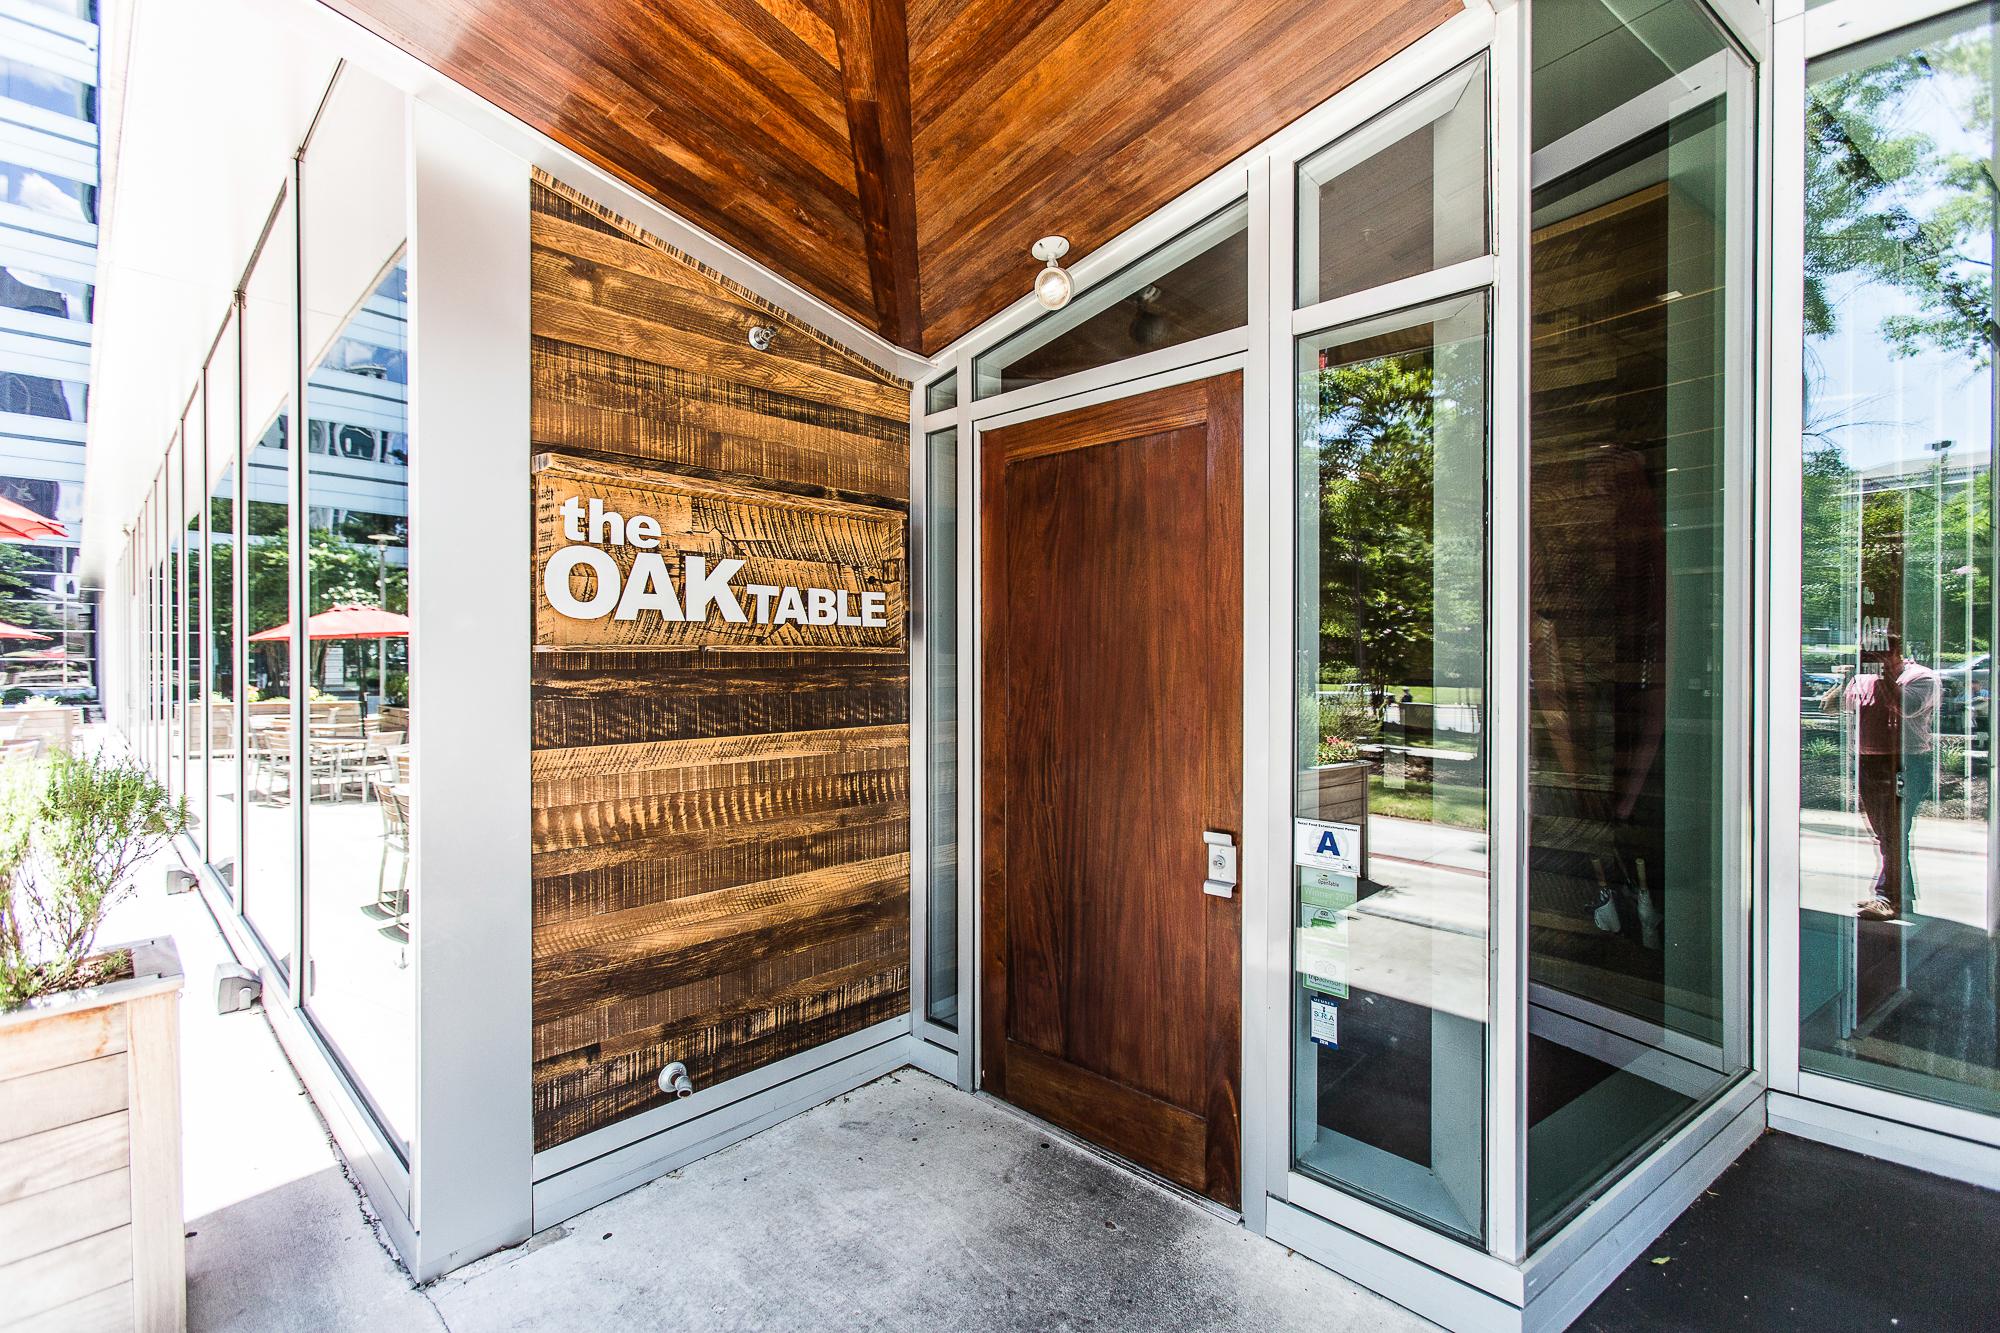 The Oak Table - 1221 Main St, Columbia, SC